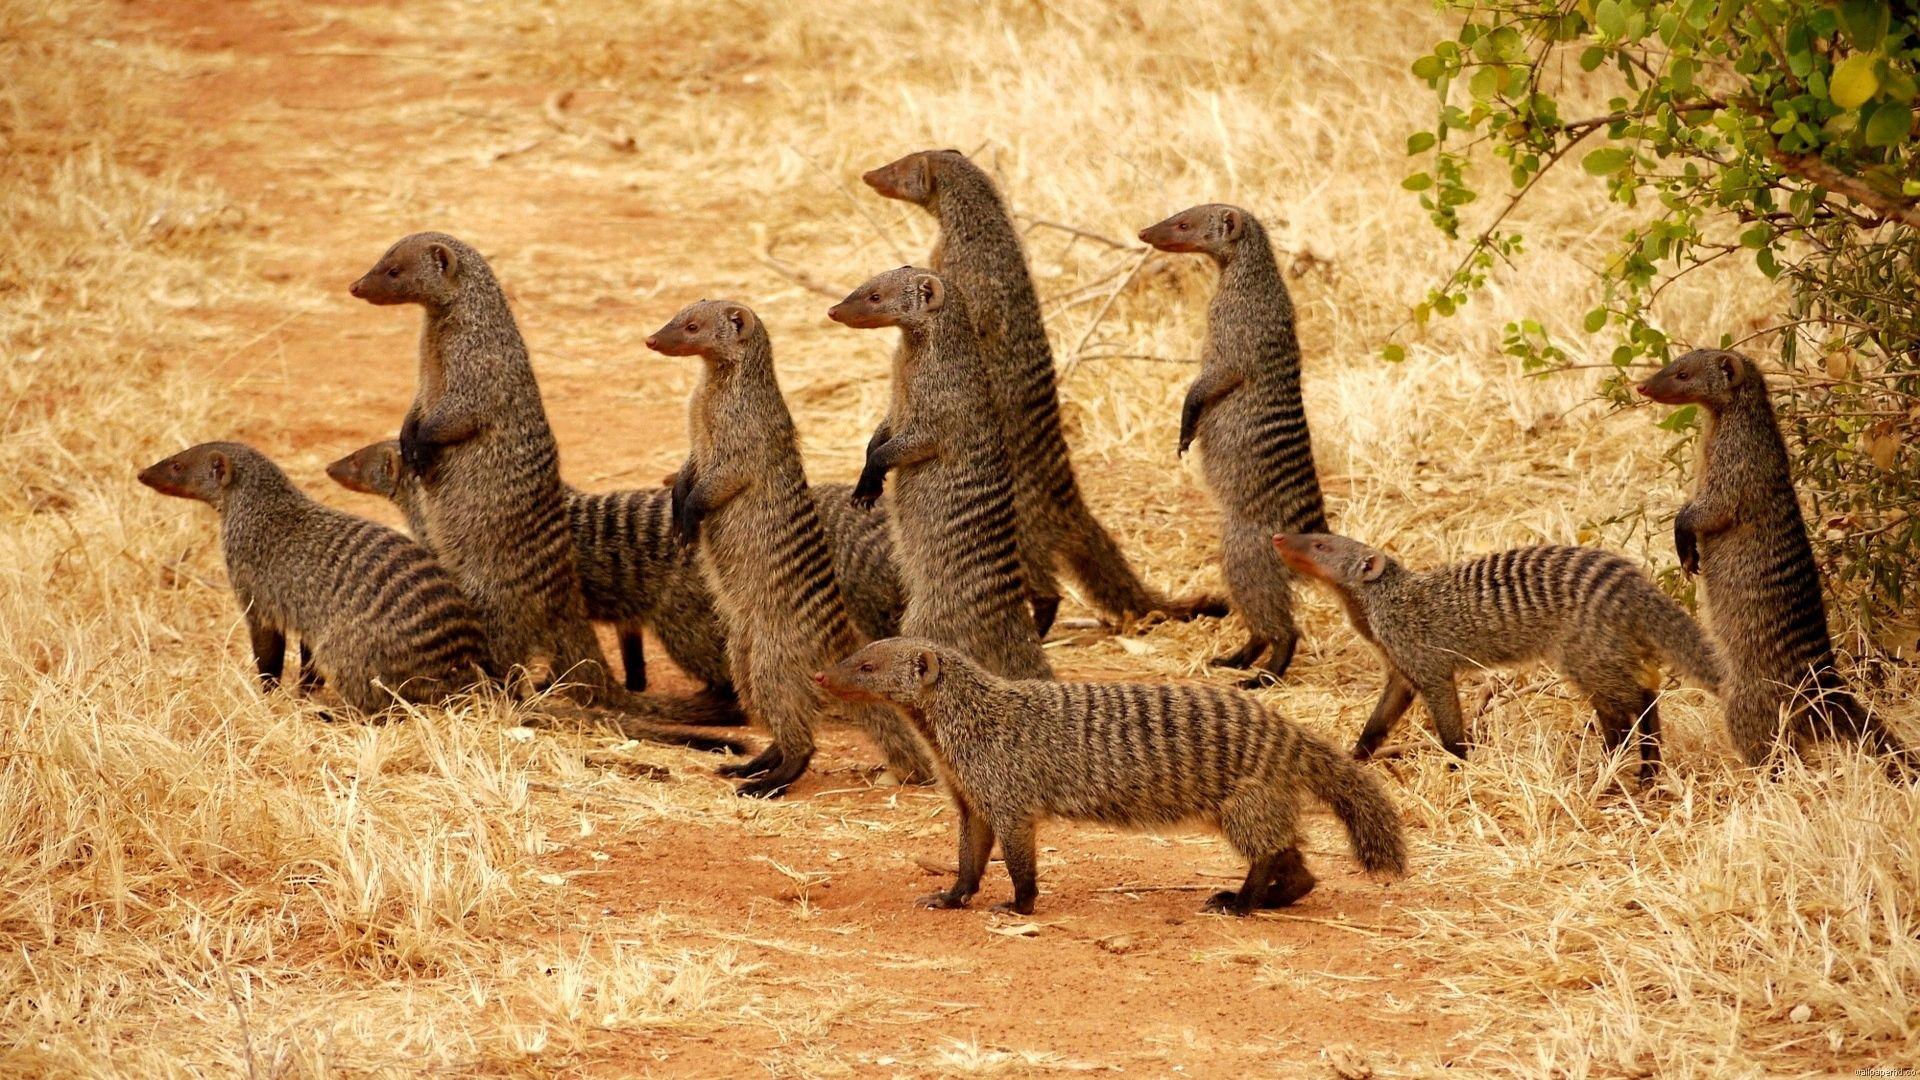 The Meerkat Or Suricate Is A Small Carnivoran Belonging To